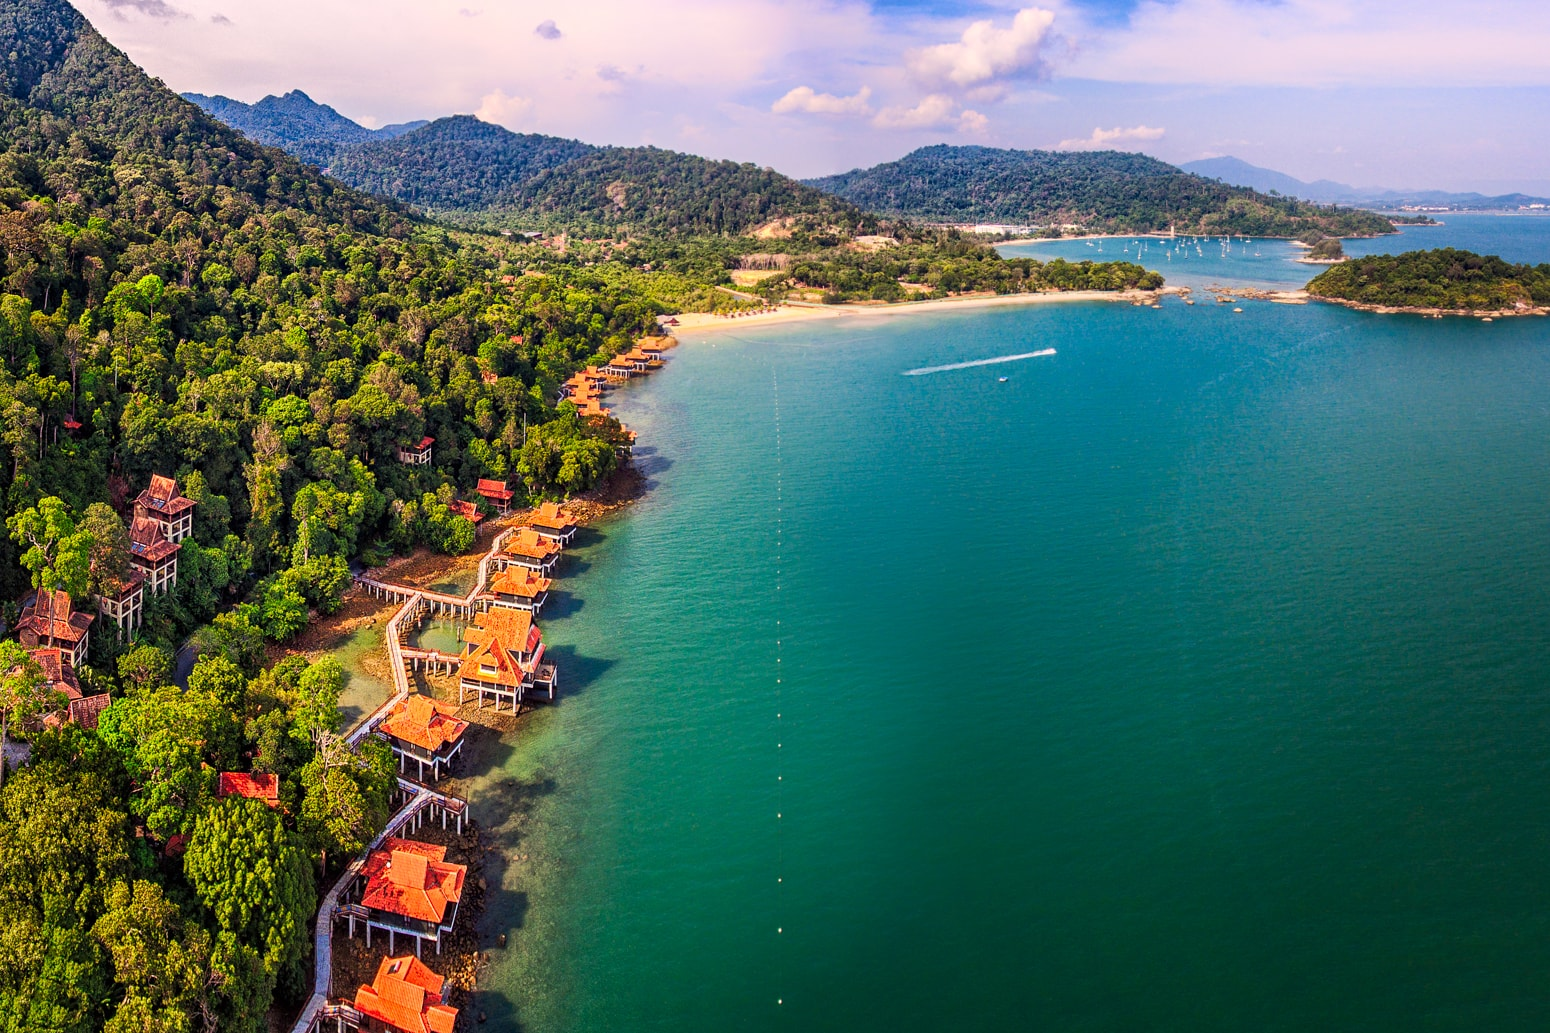 Aerial photograph of Langkawi Beach, Malaysia with Berjaya Langkawi Resort